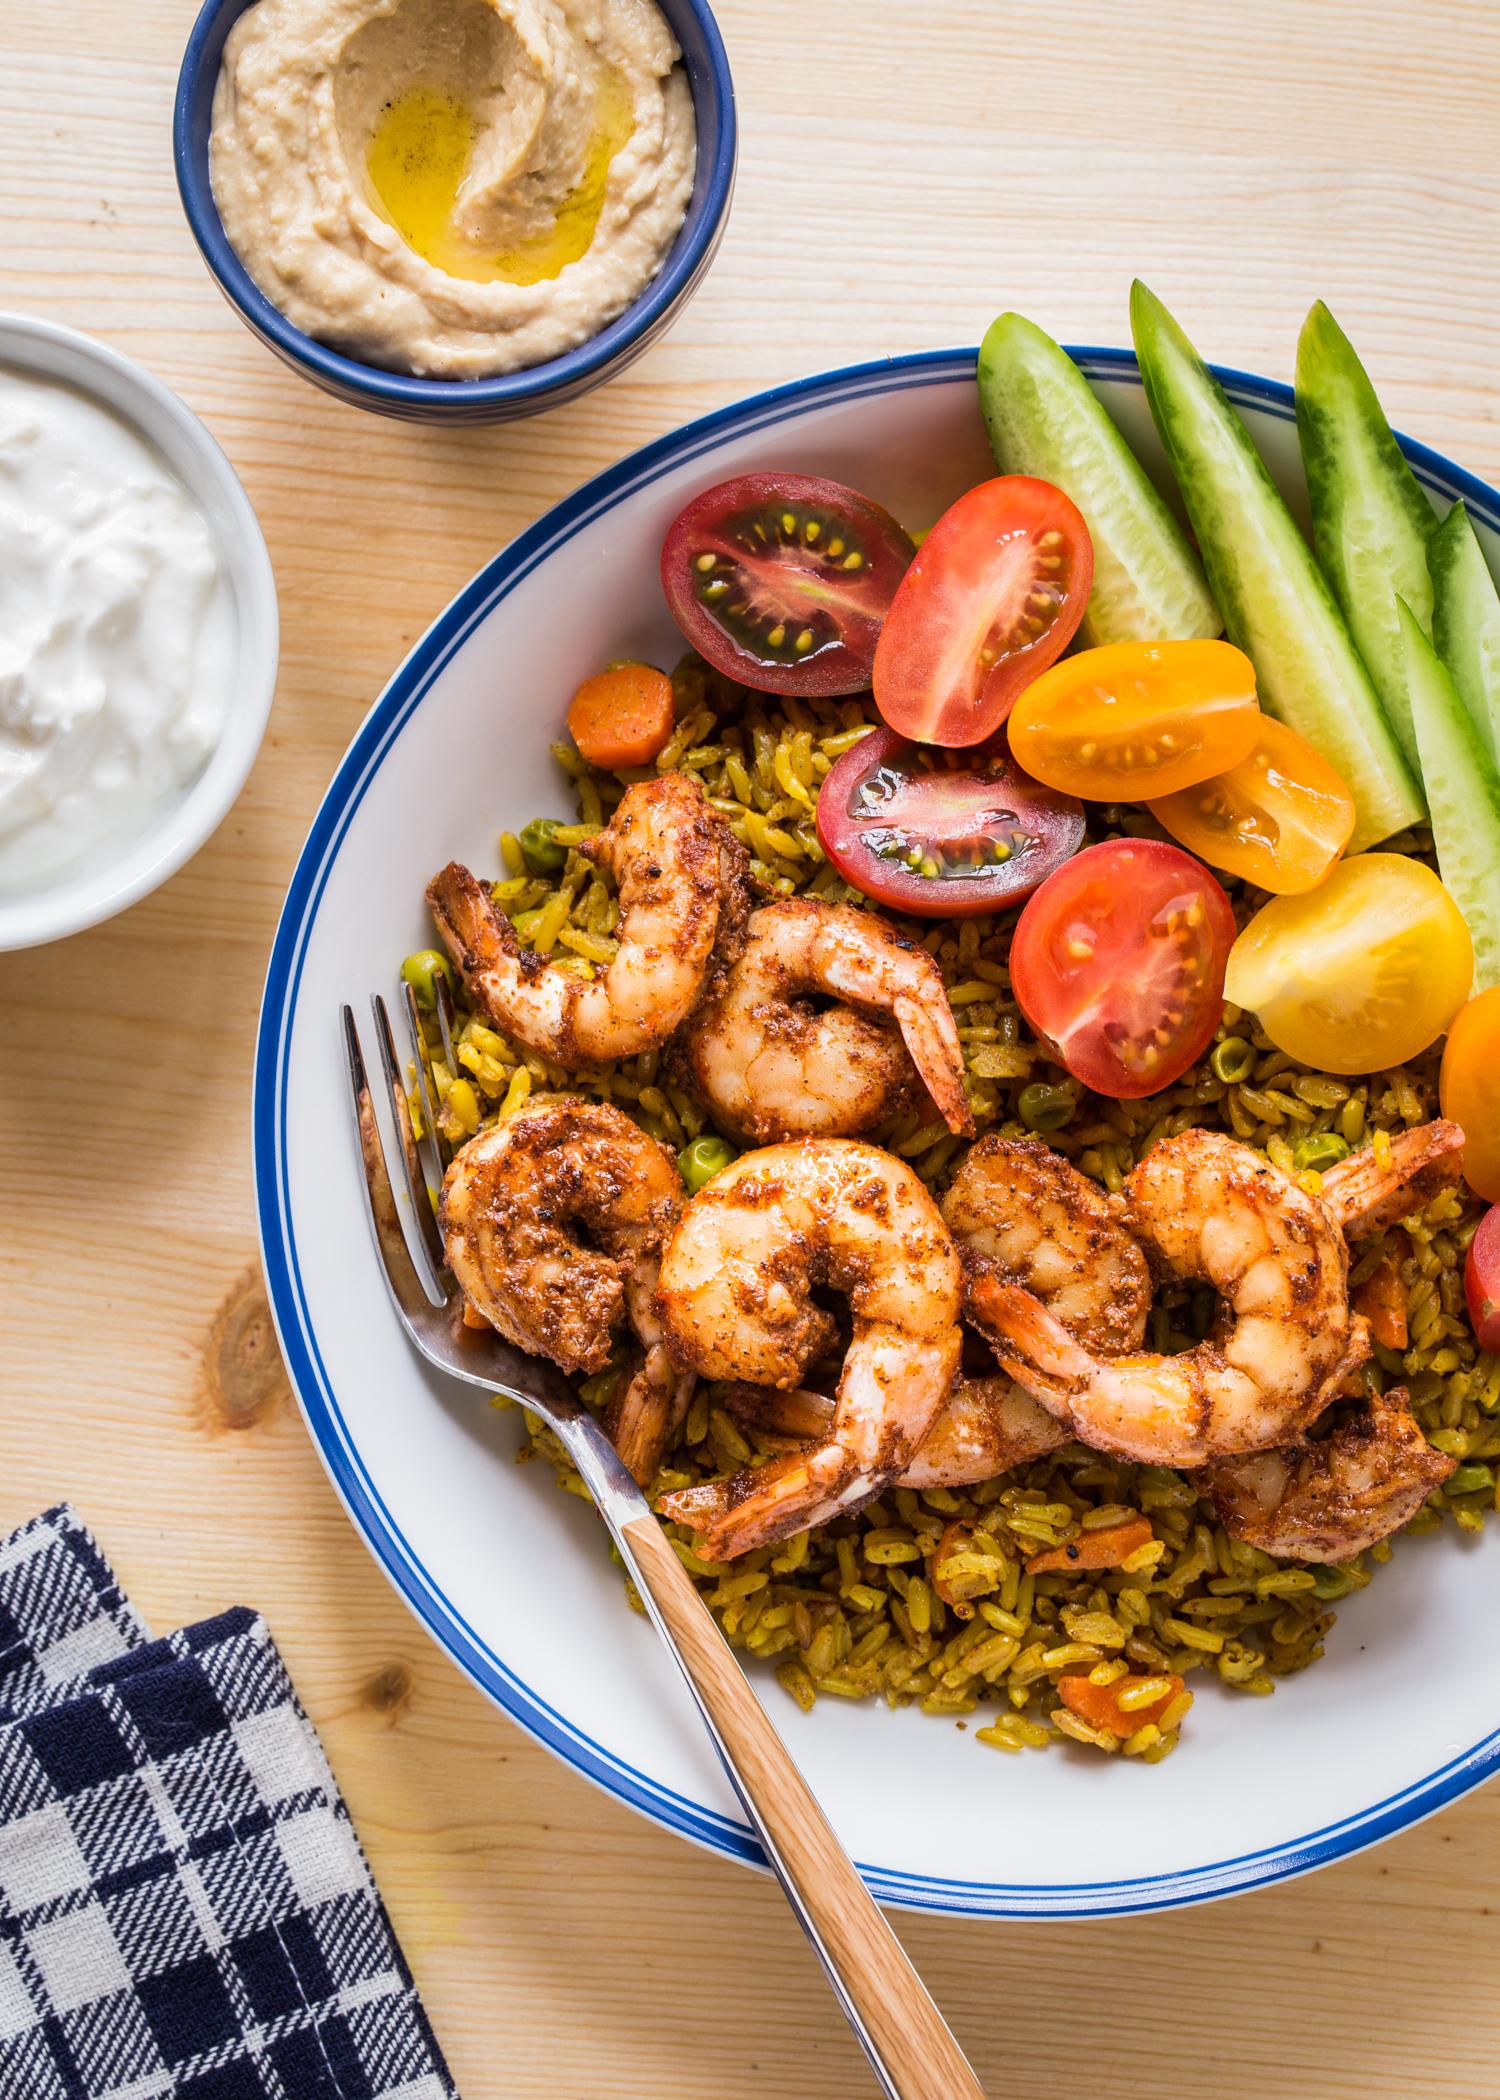 Spicy shrimp made with homemade Shawarma Seasoning are the star of these Shrimp Shawarma Bowls